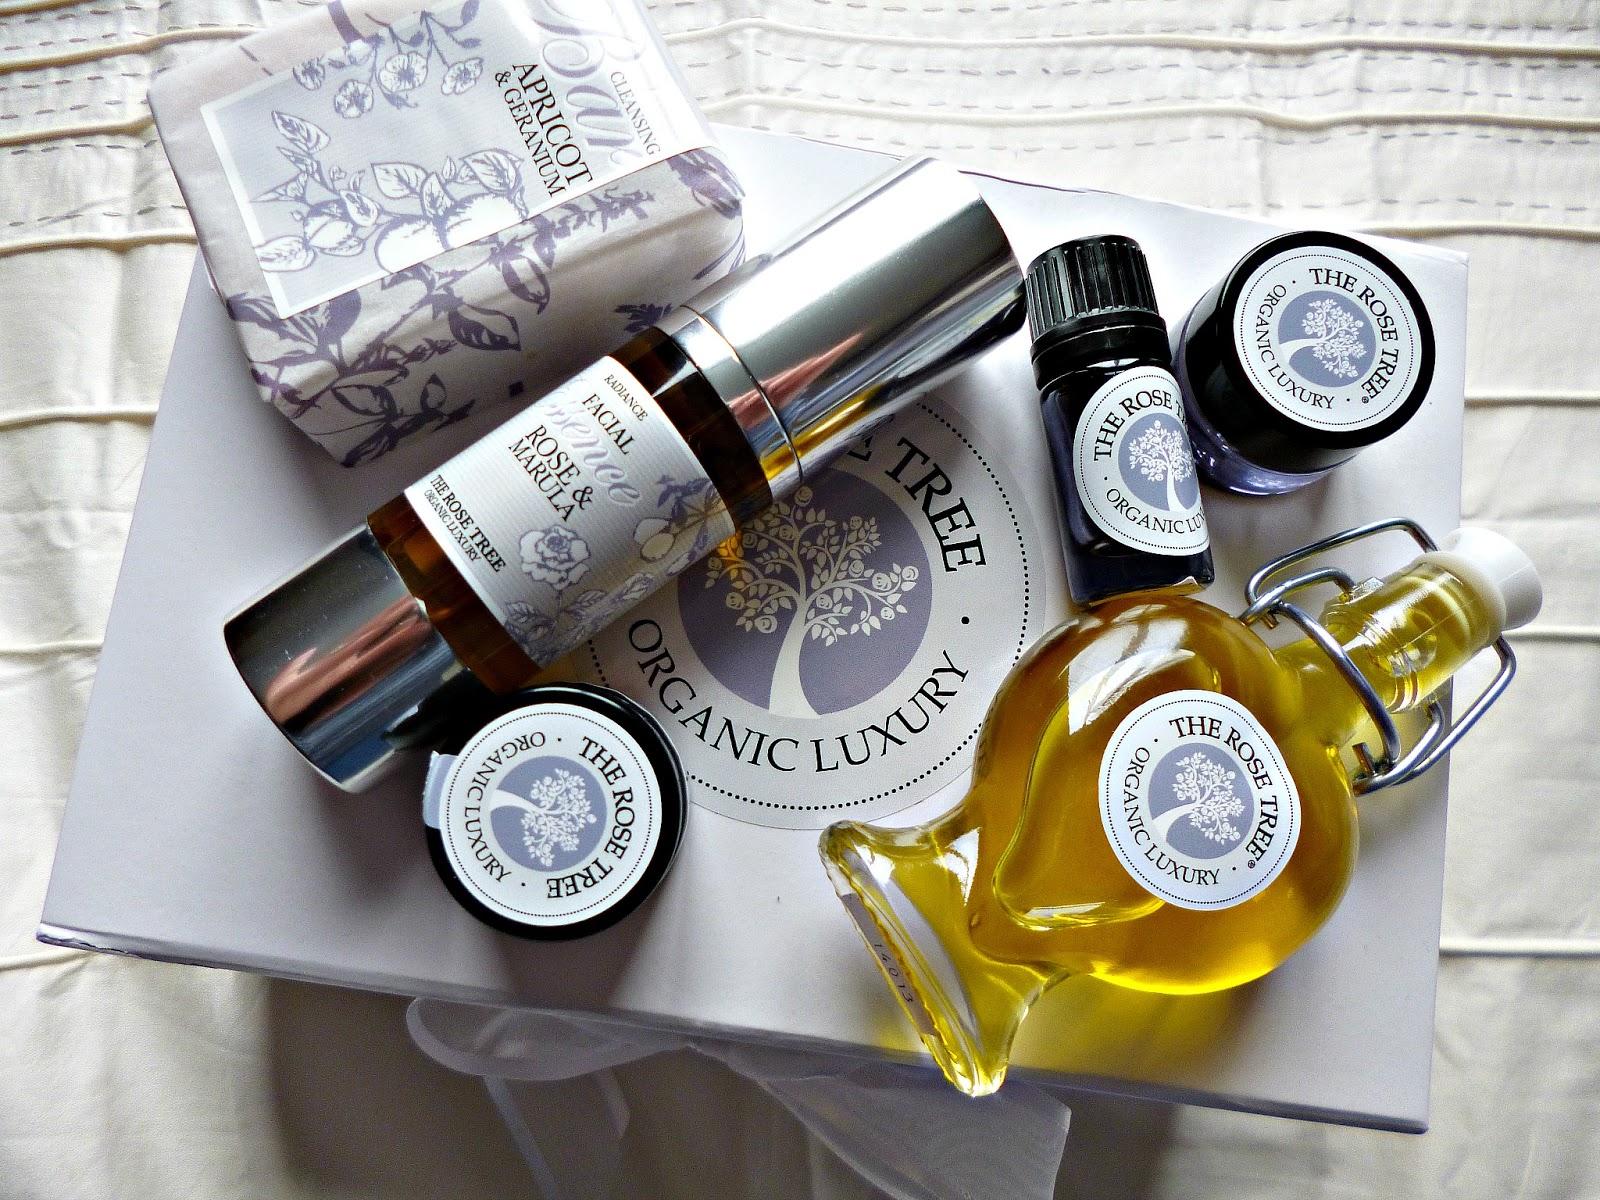 Introducing: The Rose Tree luxury organics